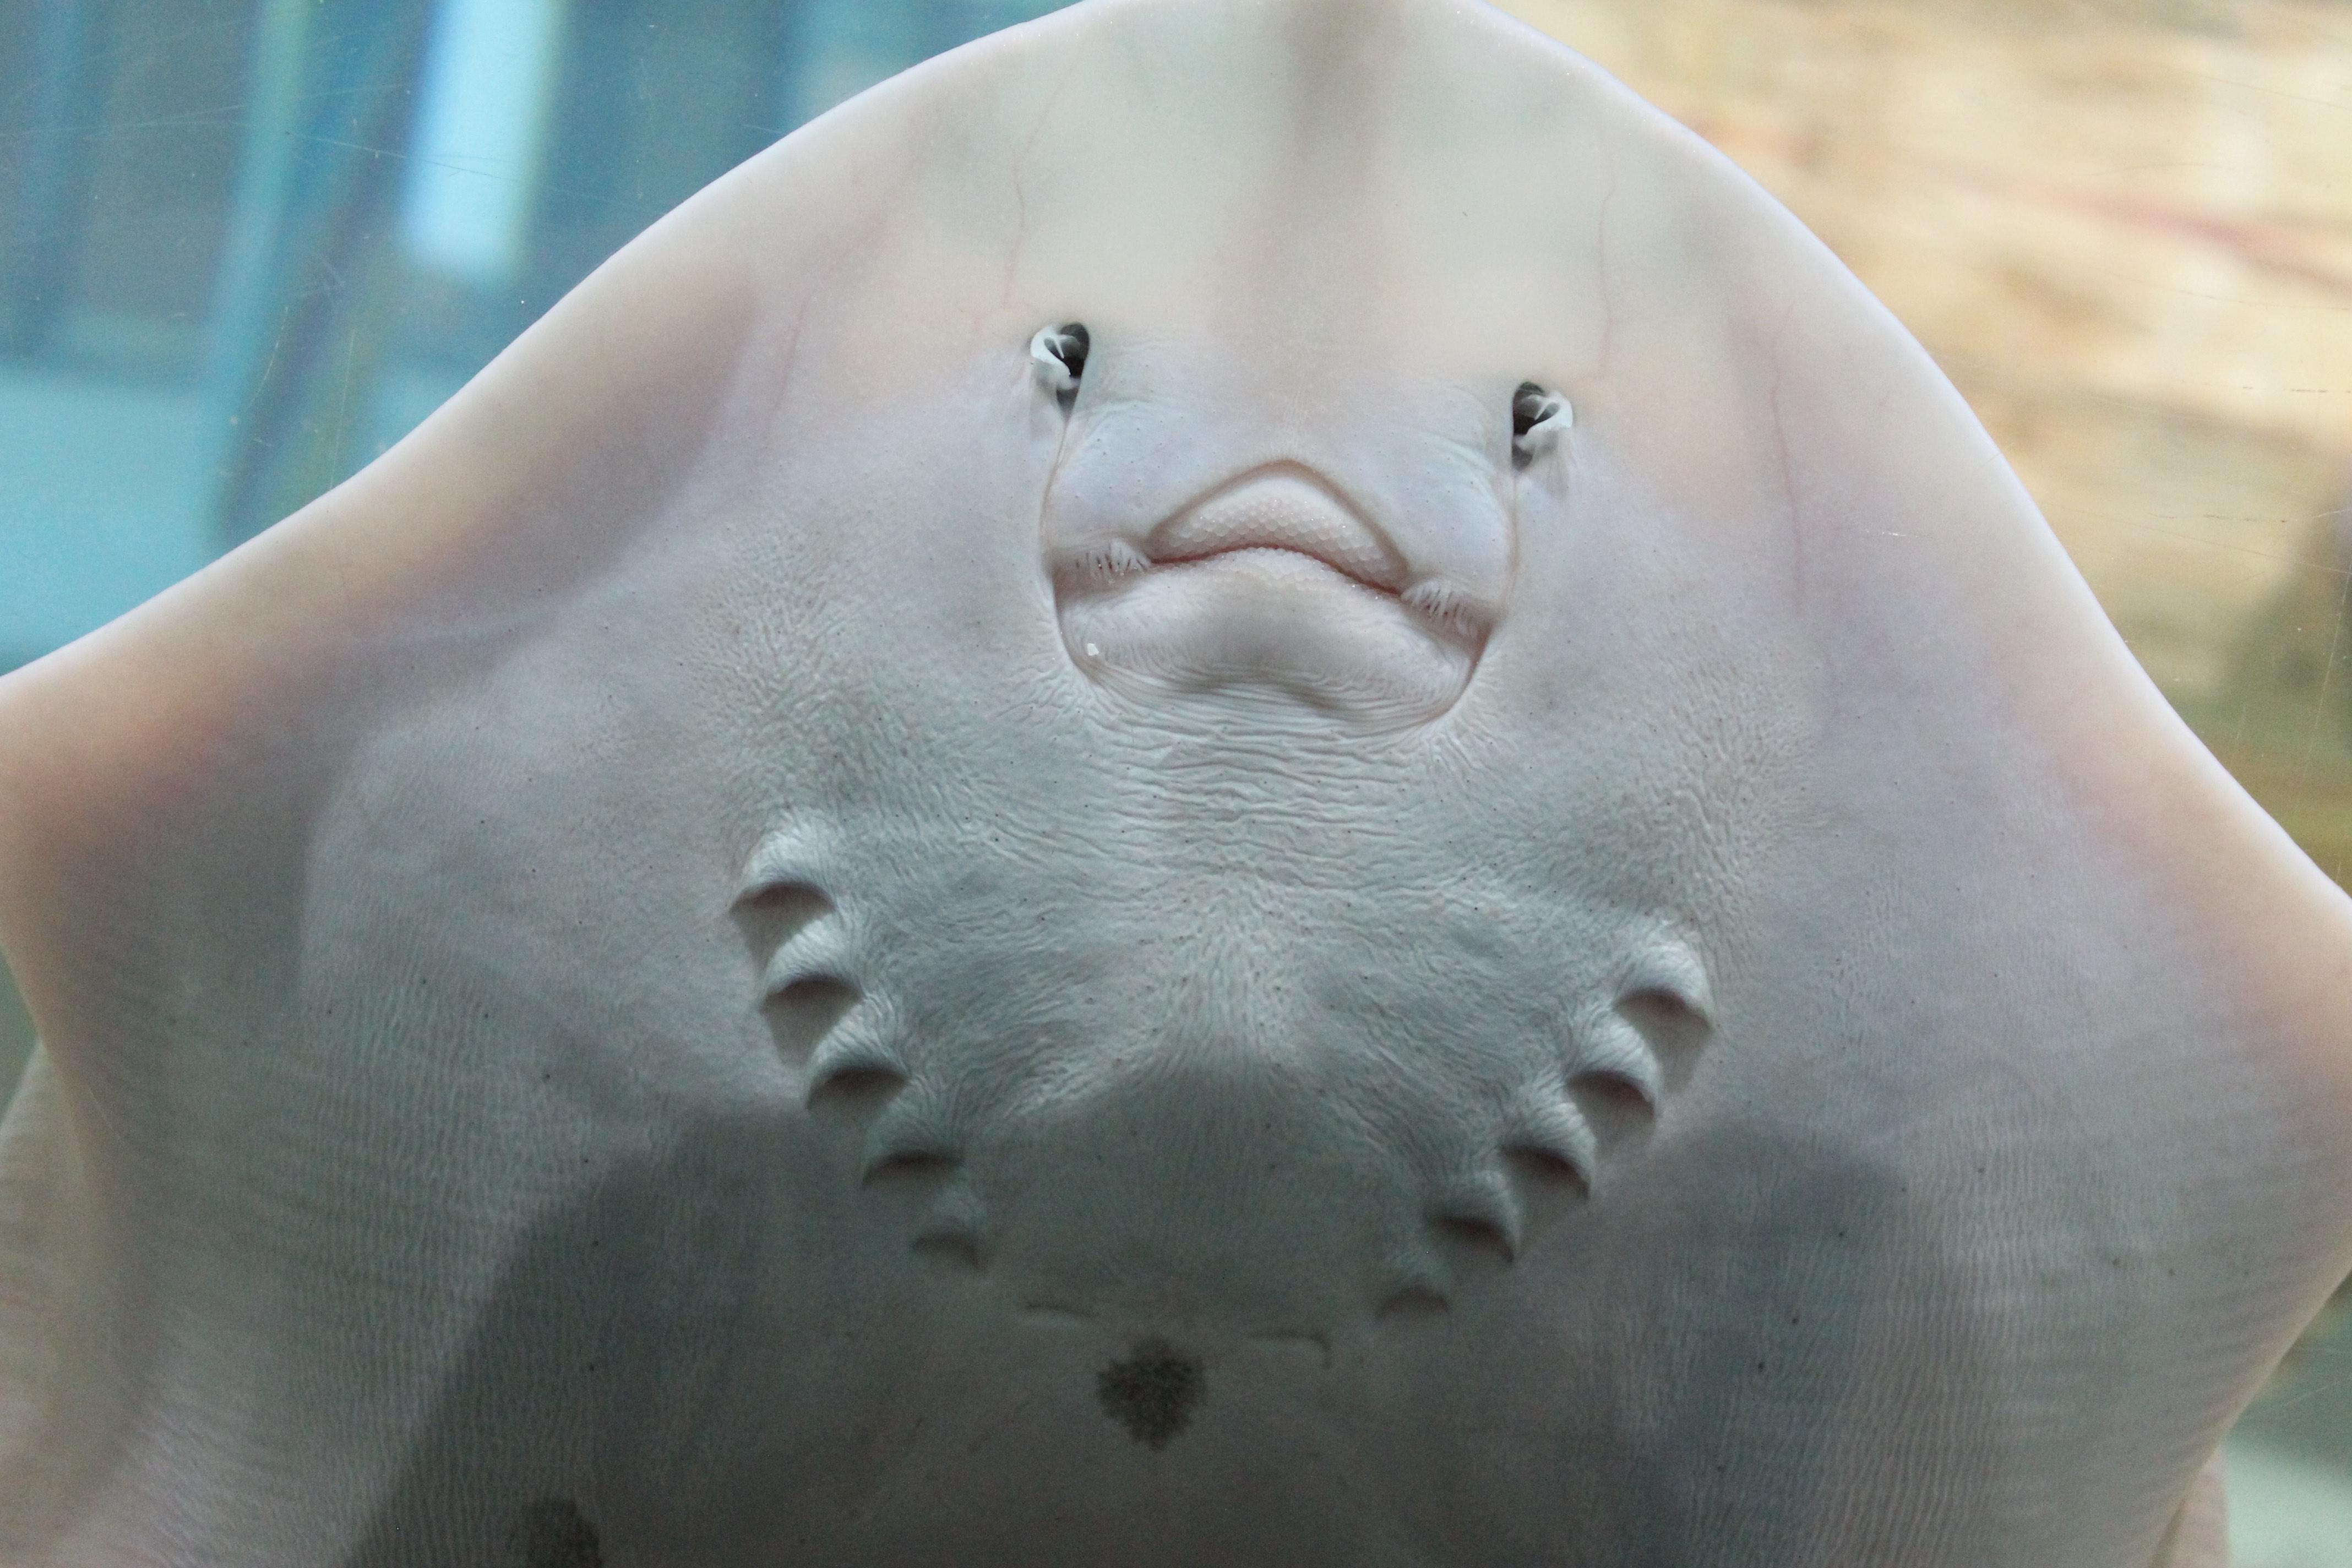 A smiling stingray (its underside) in Portaferry Aquarium. © 2016 Cordula Scherer.